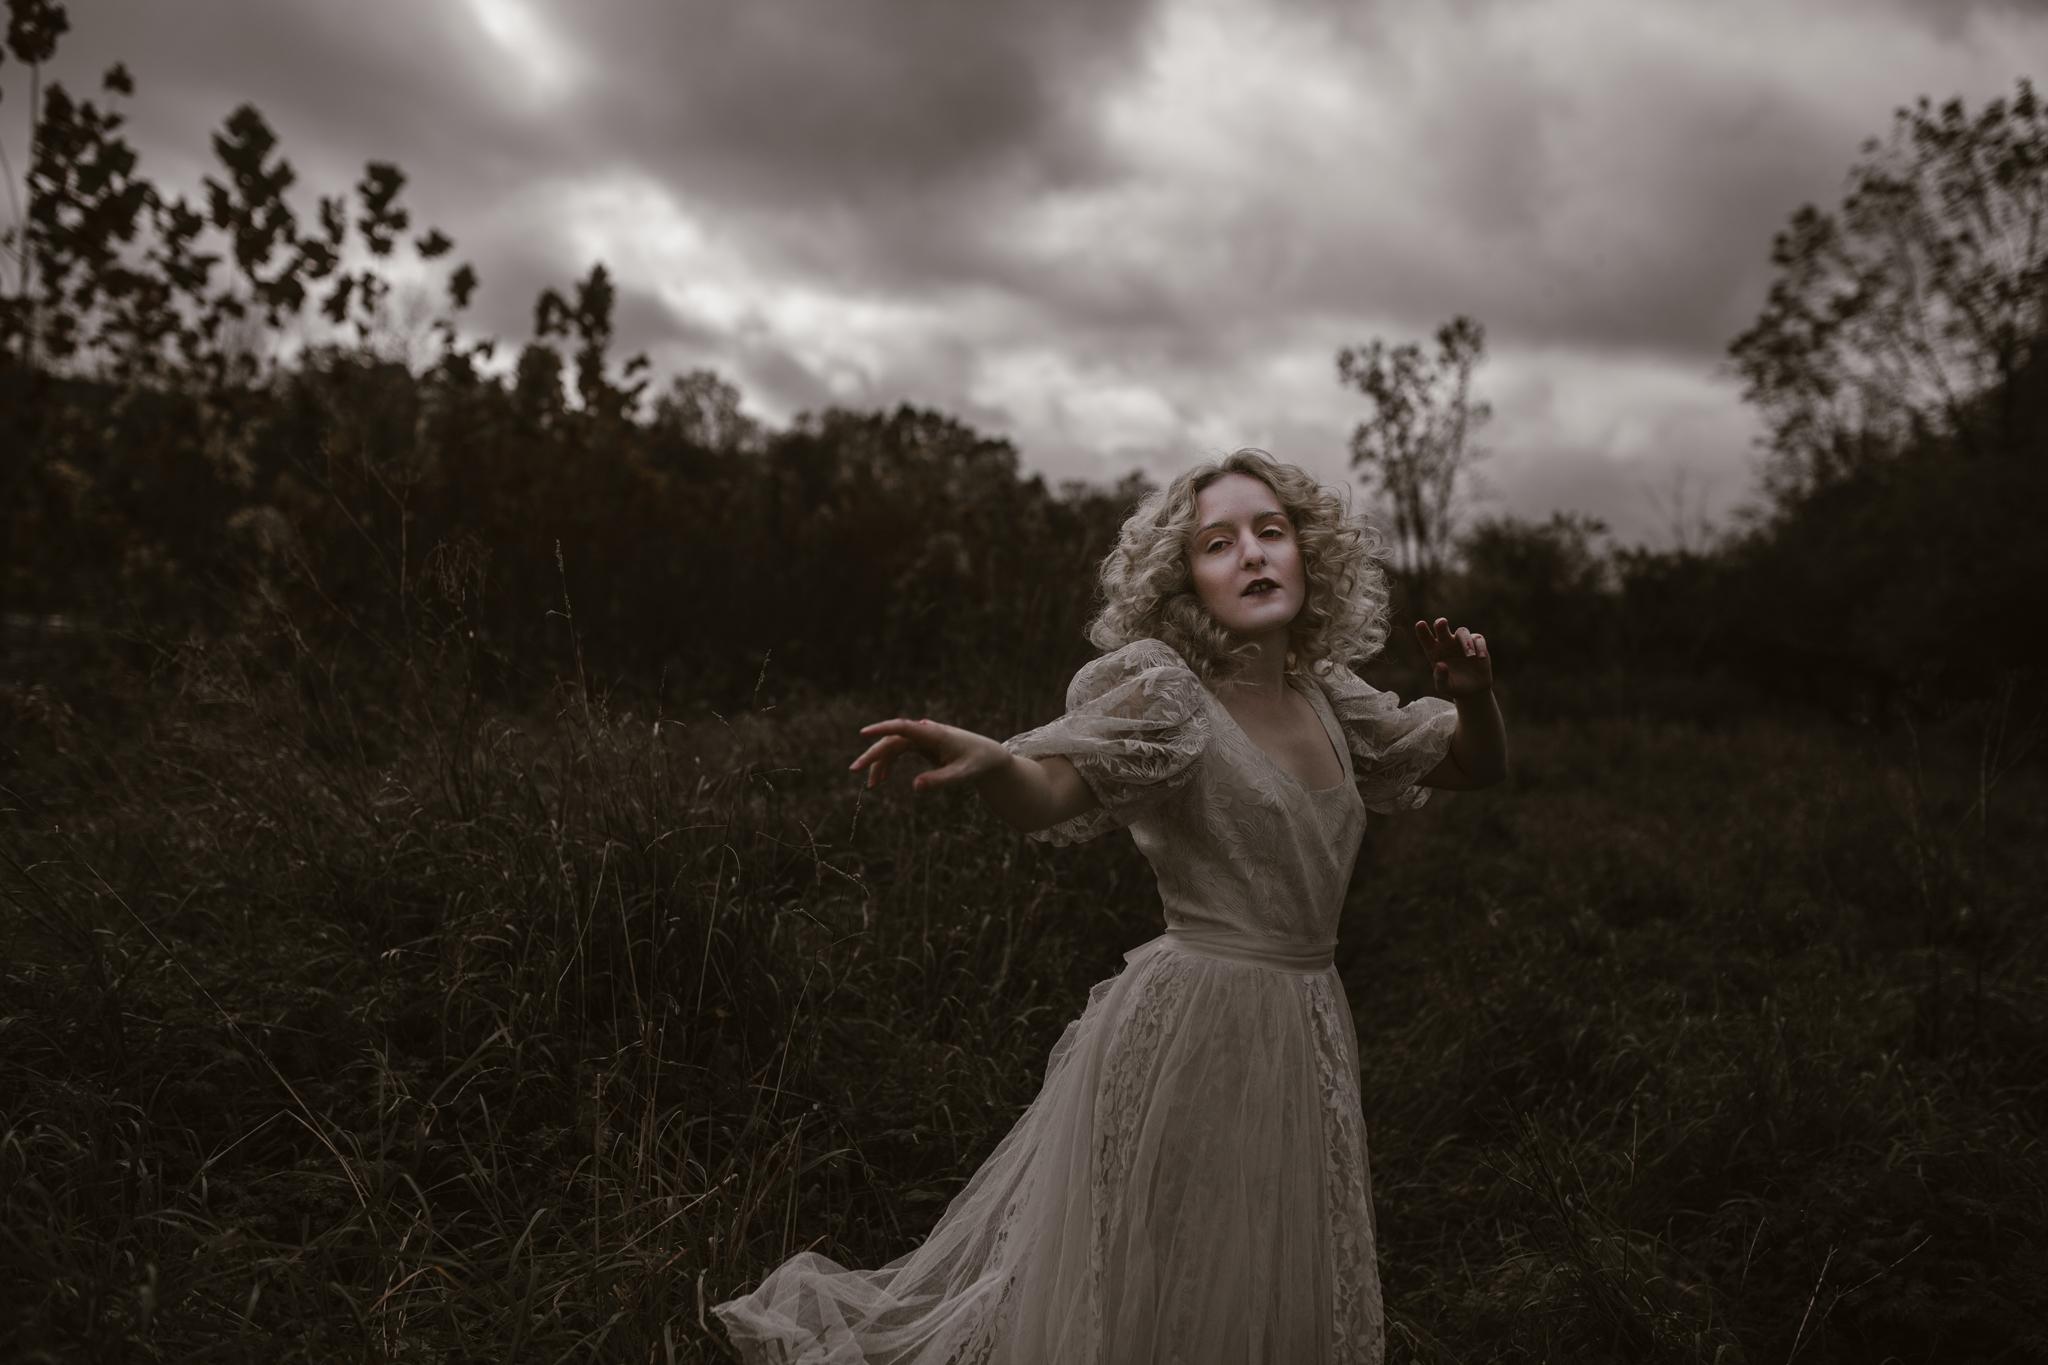 pale-witch-045fb.jpg